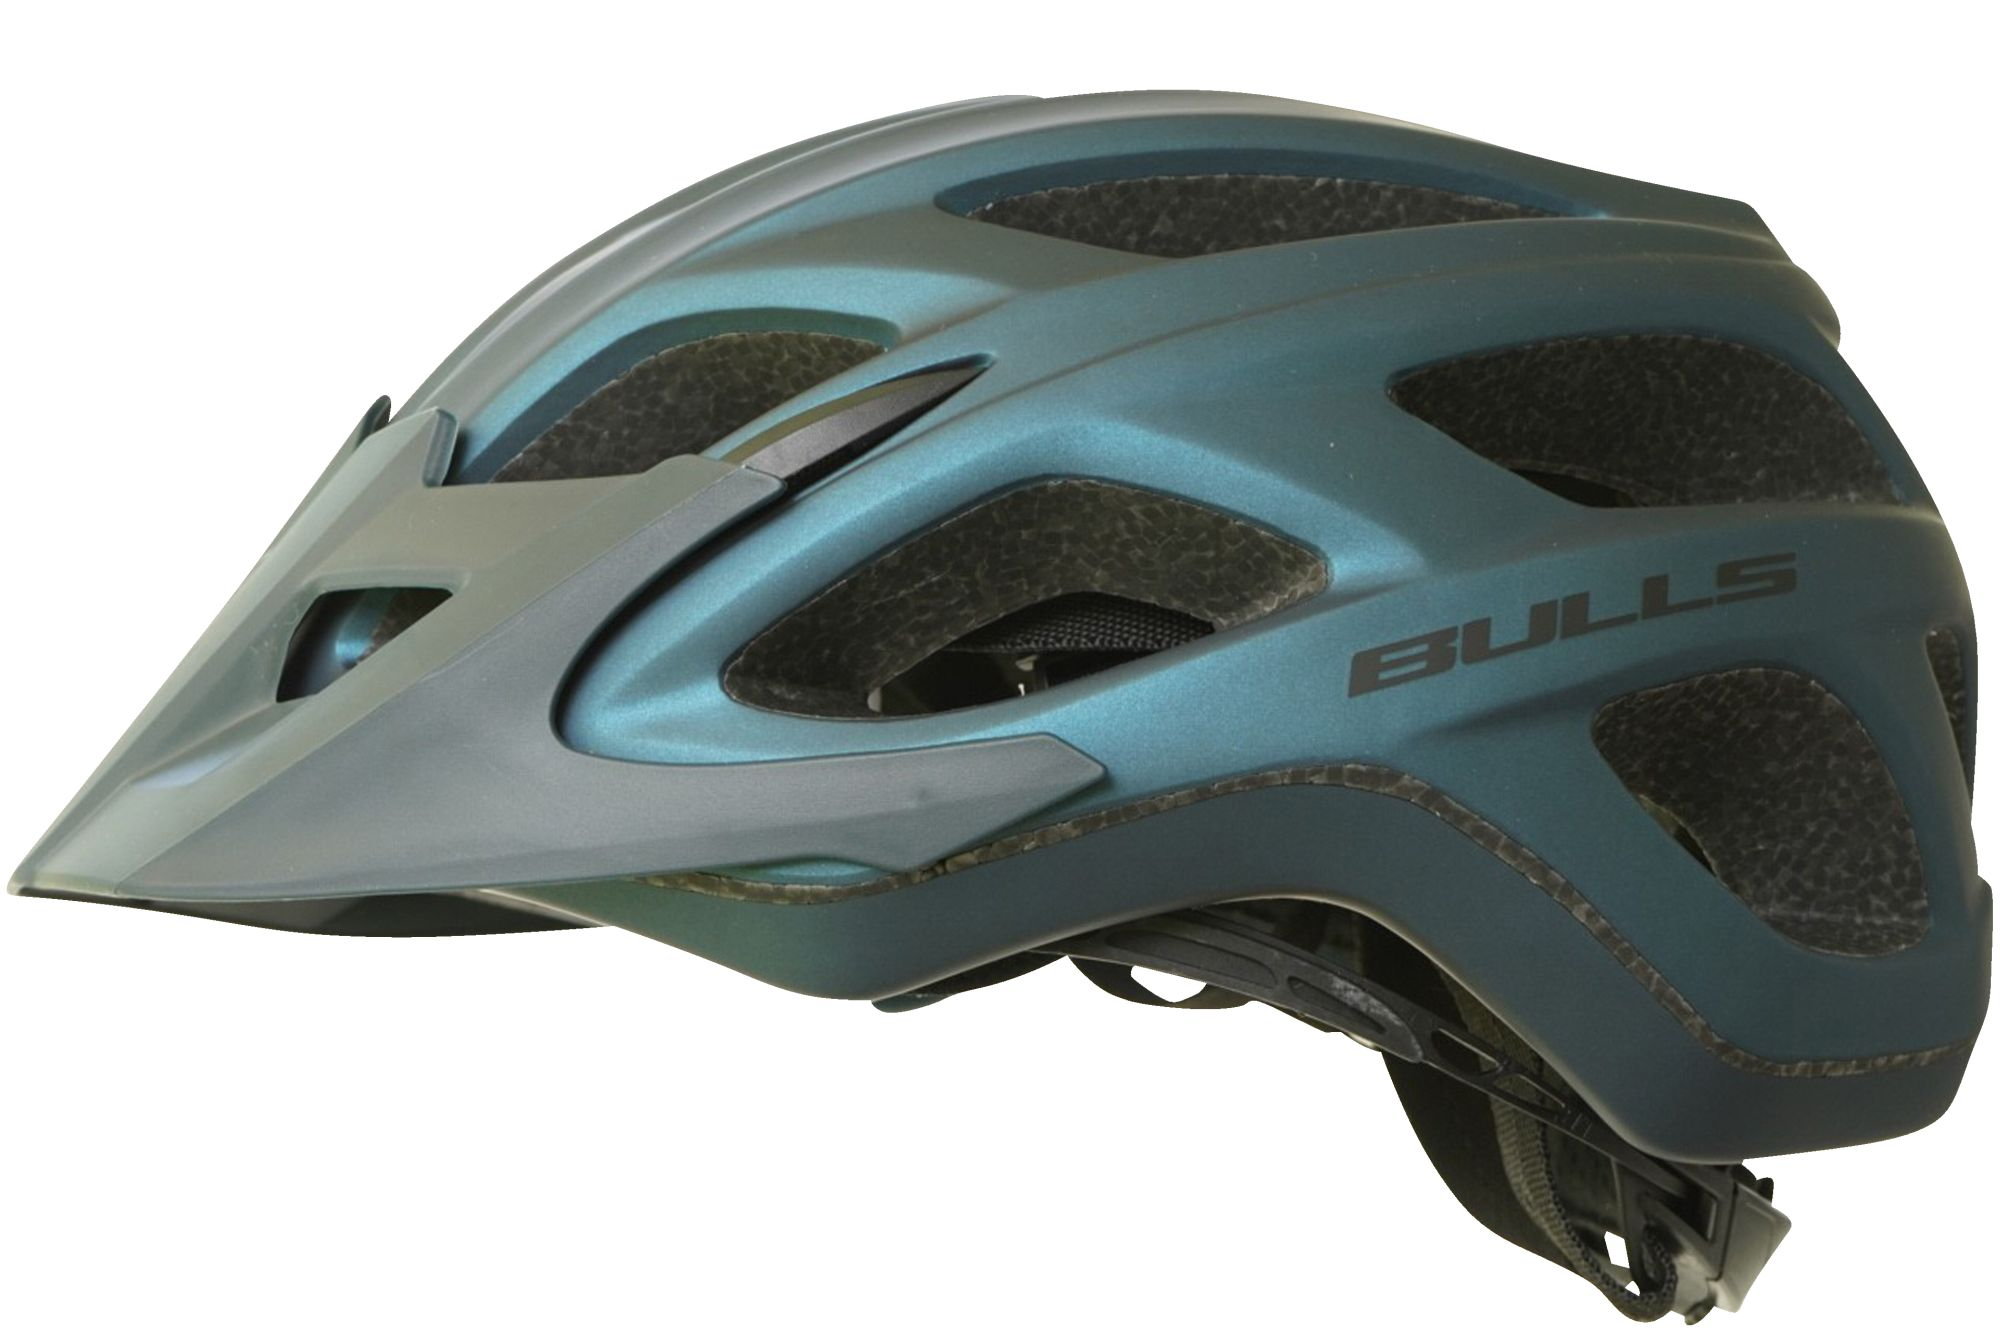 mountainbike-helme/Helme: Bulls BULLS MTB-Helm Copperhead RS 58-62 cm